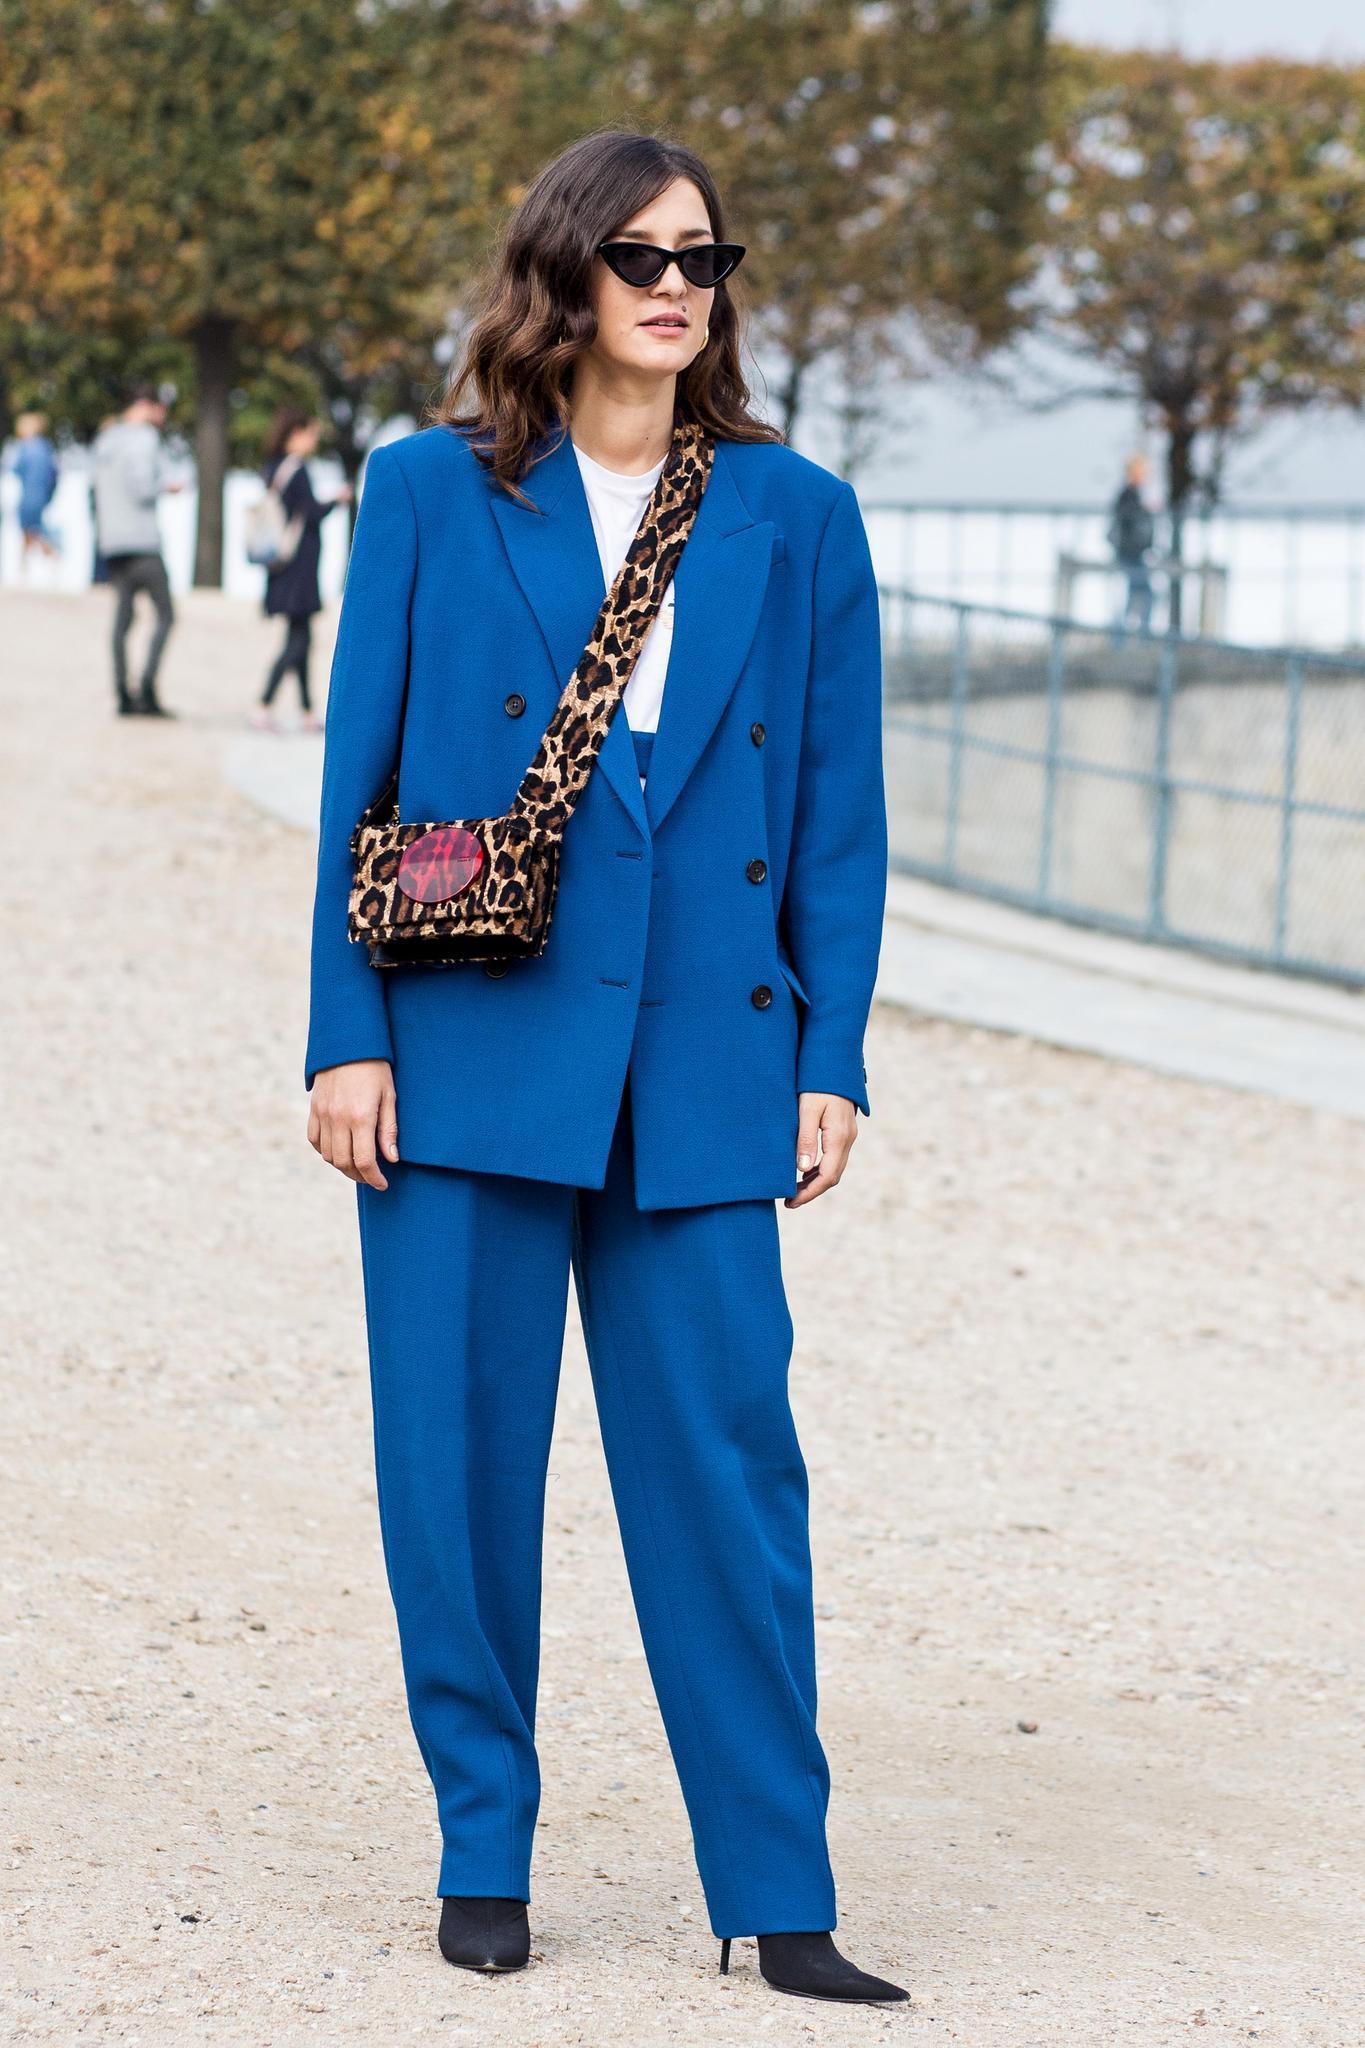 Hosenanzug: Oversize Suit an einer Frau